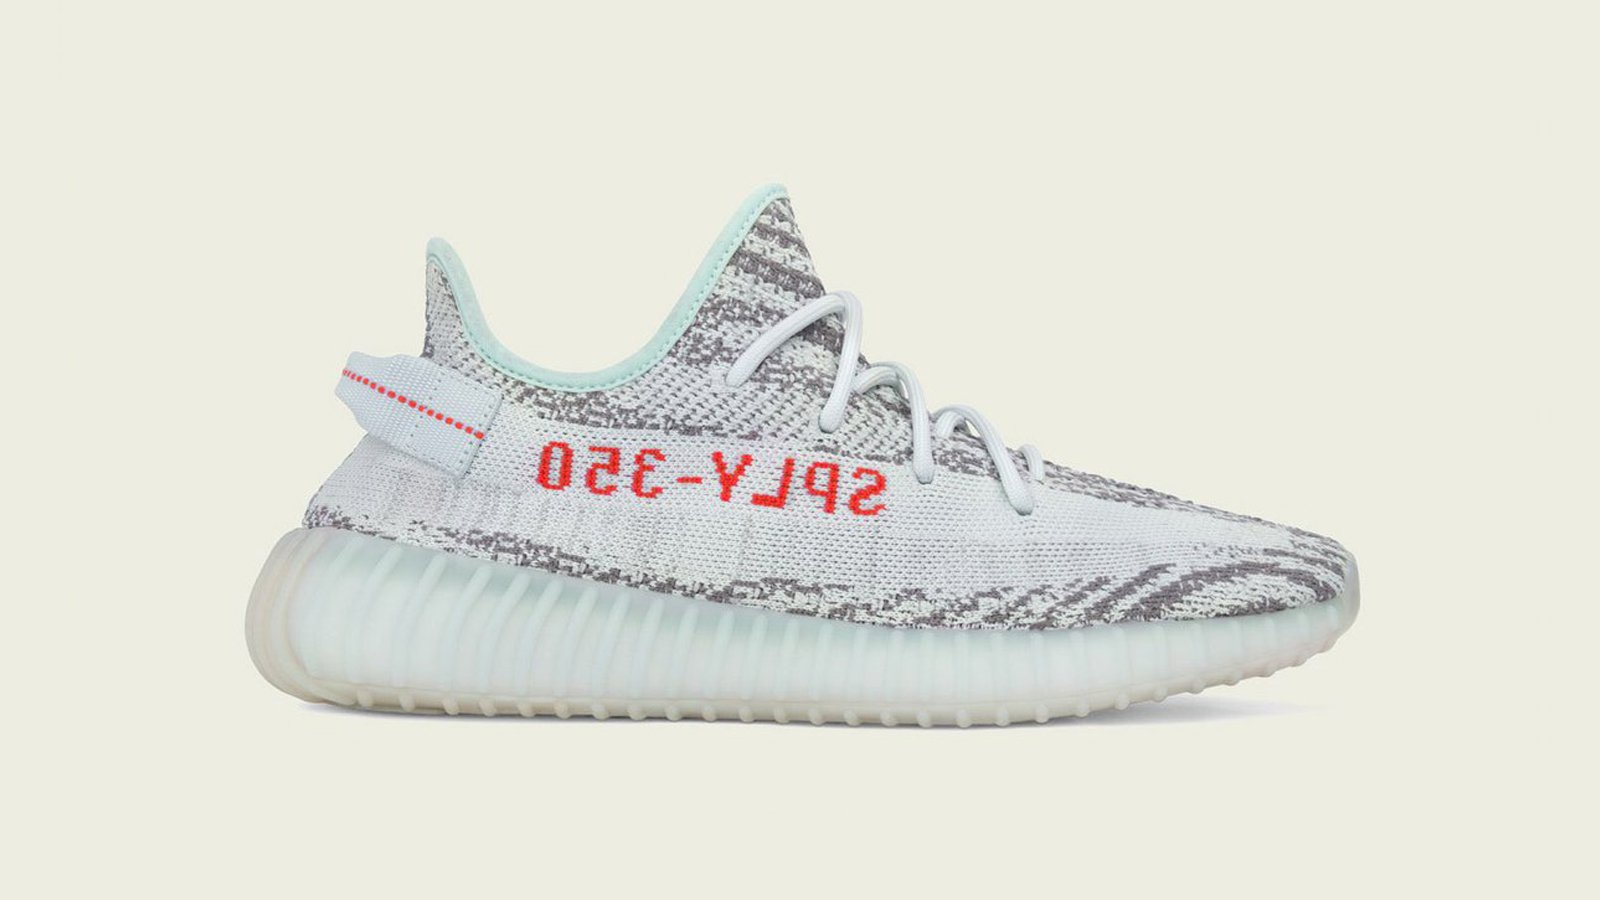 8010637b9fcbd adidas Yeezy Boost 350 V2  Blue Tint  Blue Tint Grey Three Hi-Res Red  220